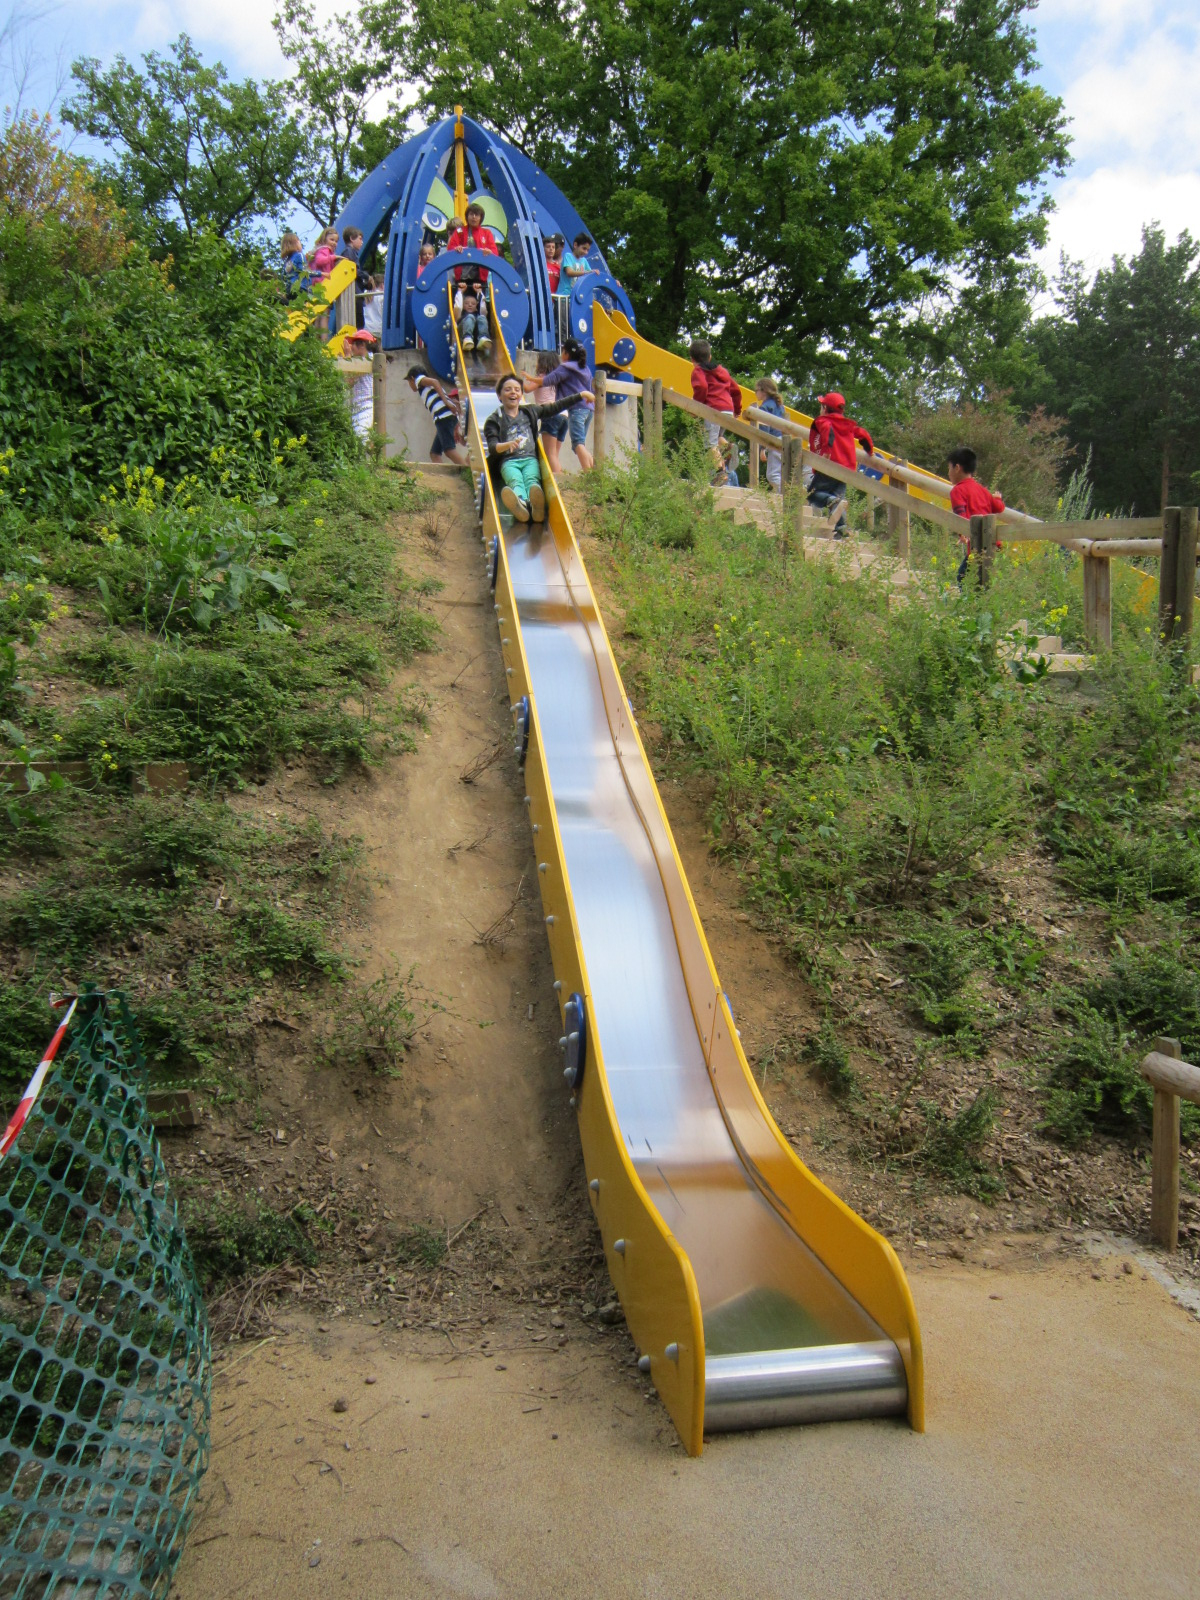 Le Toboggan (Mayeul Et Hugo) - Le Blog De L'école De Contay concernant Grand Toboggan Jardin